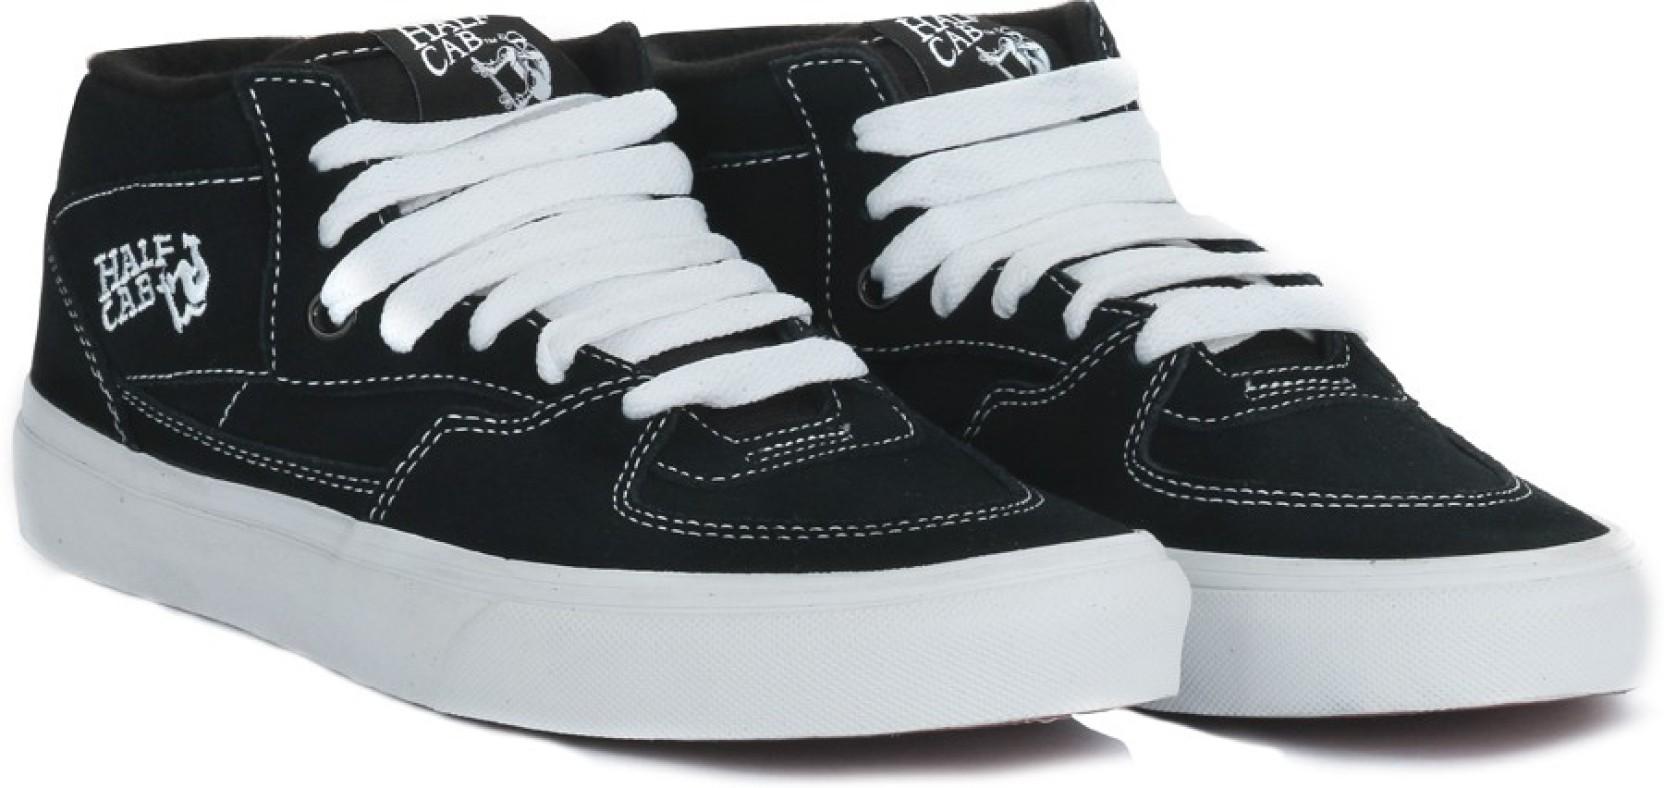 52ac6562f8 Vans HALF CAB Sneakers For Men - Buy NAVY Color Vans HALF CAB ...